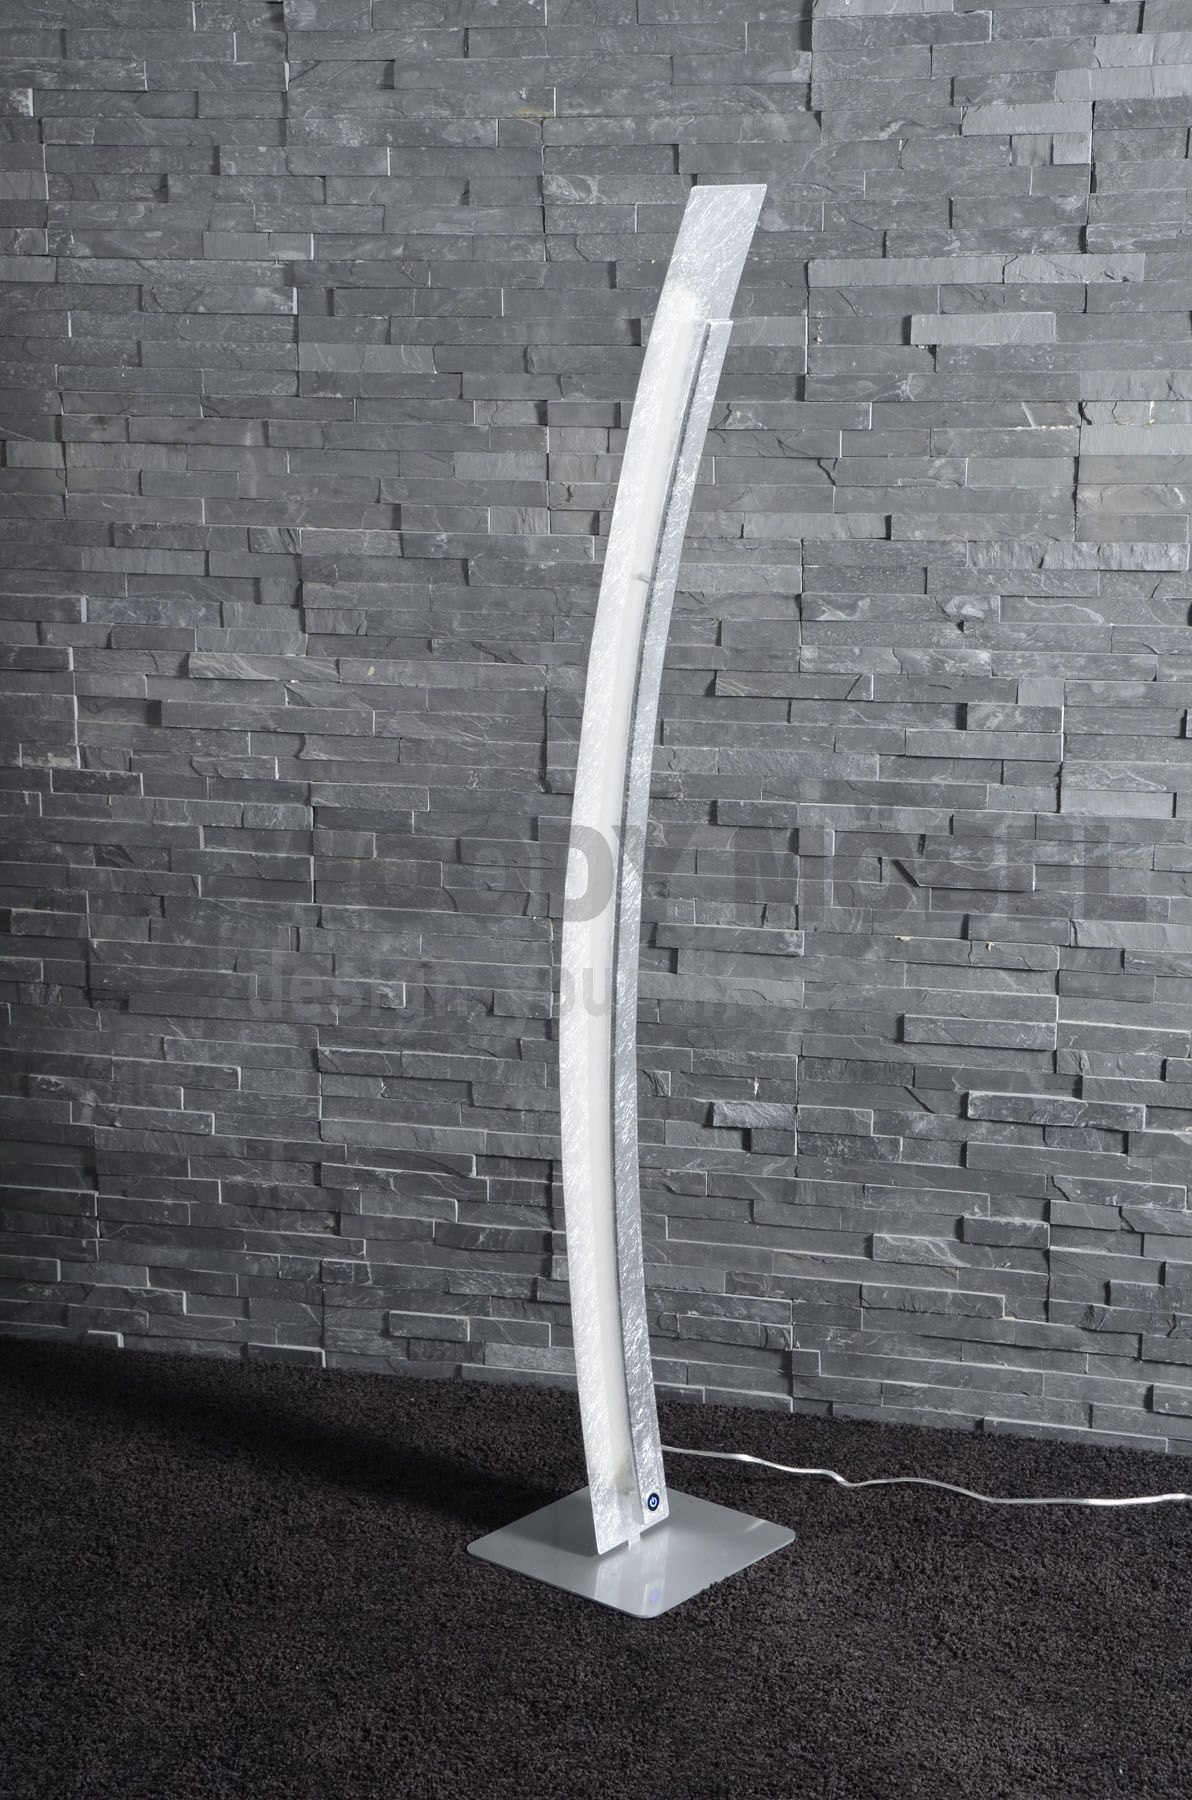 Faszinierend Stehlampe Bogen Ideen Von 30 Watt Led Dimmbar Woody 83-00373 Silber